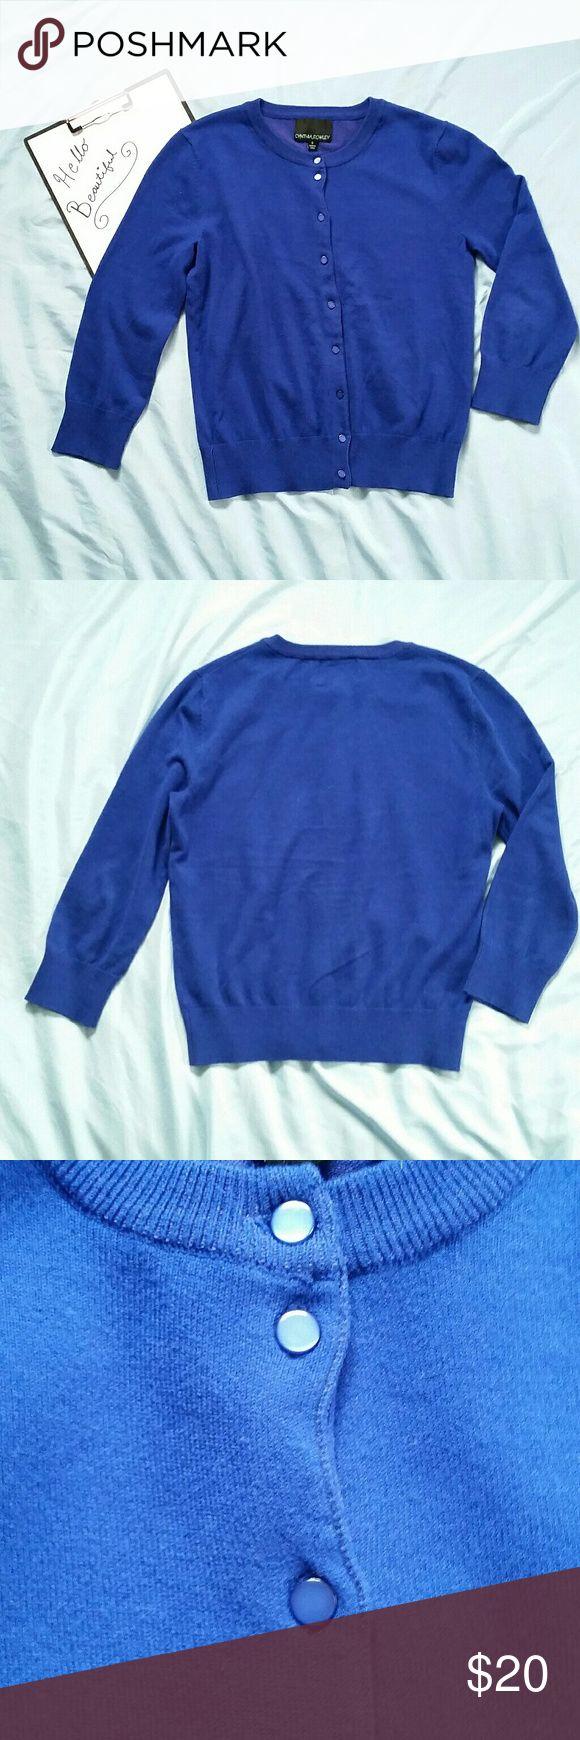 Selling this Royal Blue Cynthia Rowley Cardigan Sweater on Poshmark! My username is: _mandylou_. #shopmycloset #poshmark #fashion #shopping #style #forsale #Cynthia Rowley #Sweaters